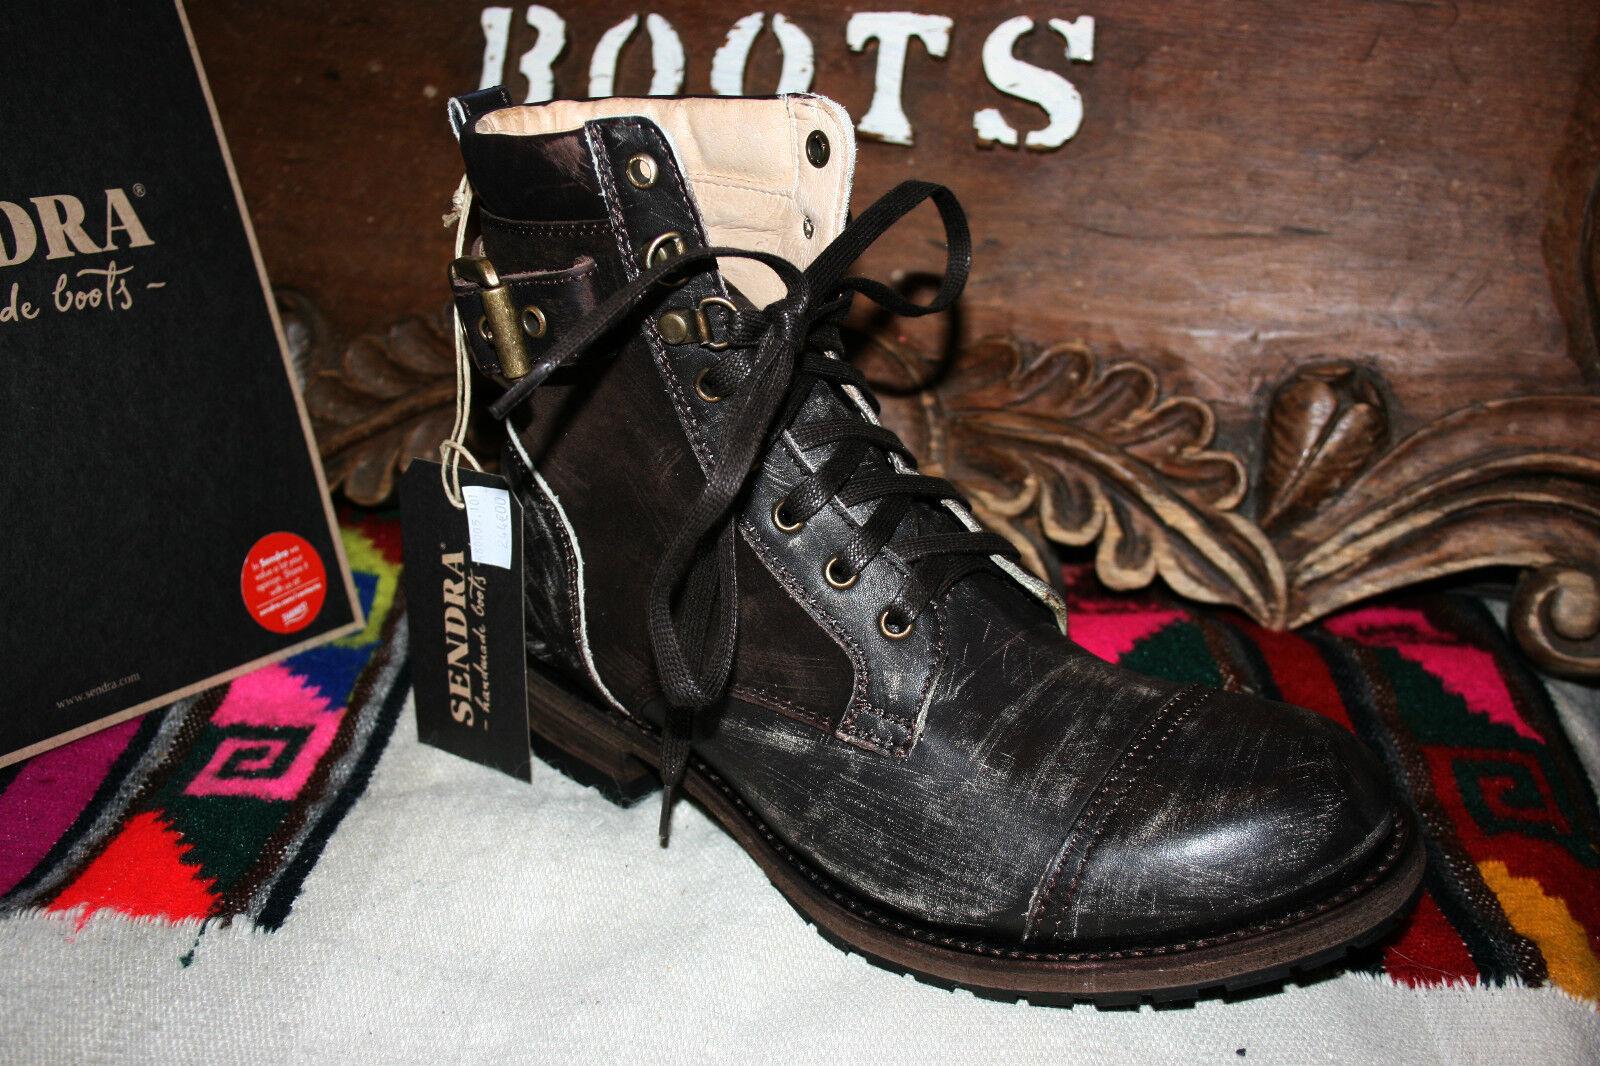 11935 Sendra chaussure brun foncé used série limited***Superbe promo***